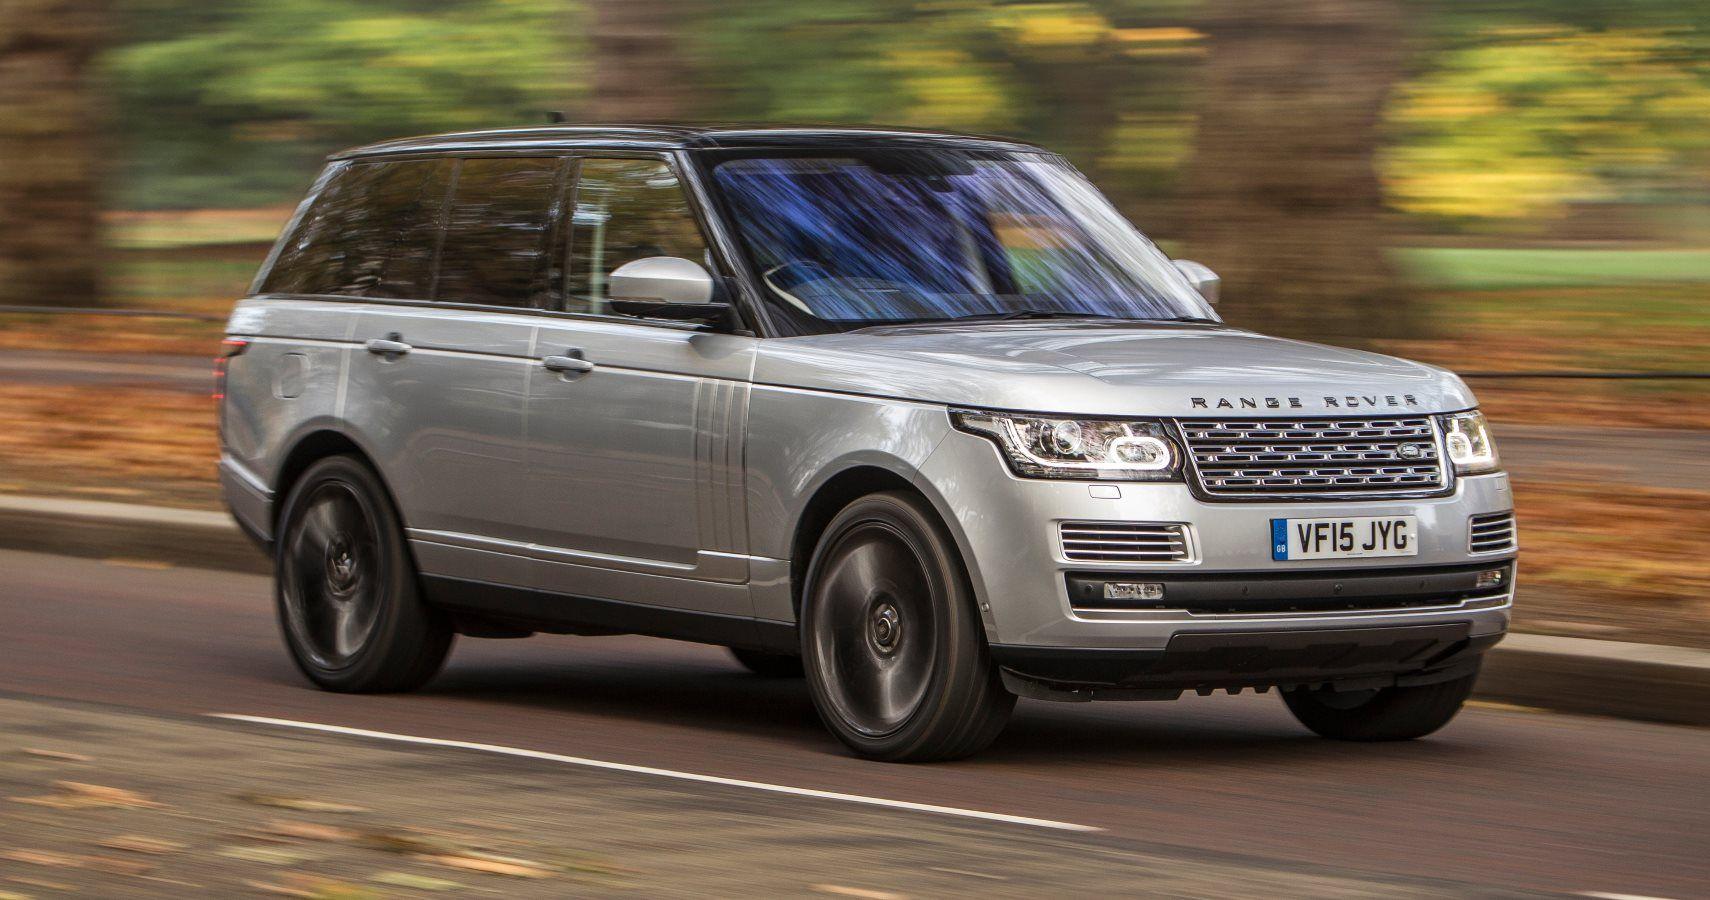 Range Rover sport wrap Matte black vinyl - 10-4WRAPS - Vehicle Wraps Destin